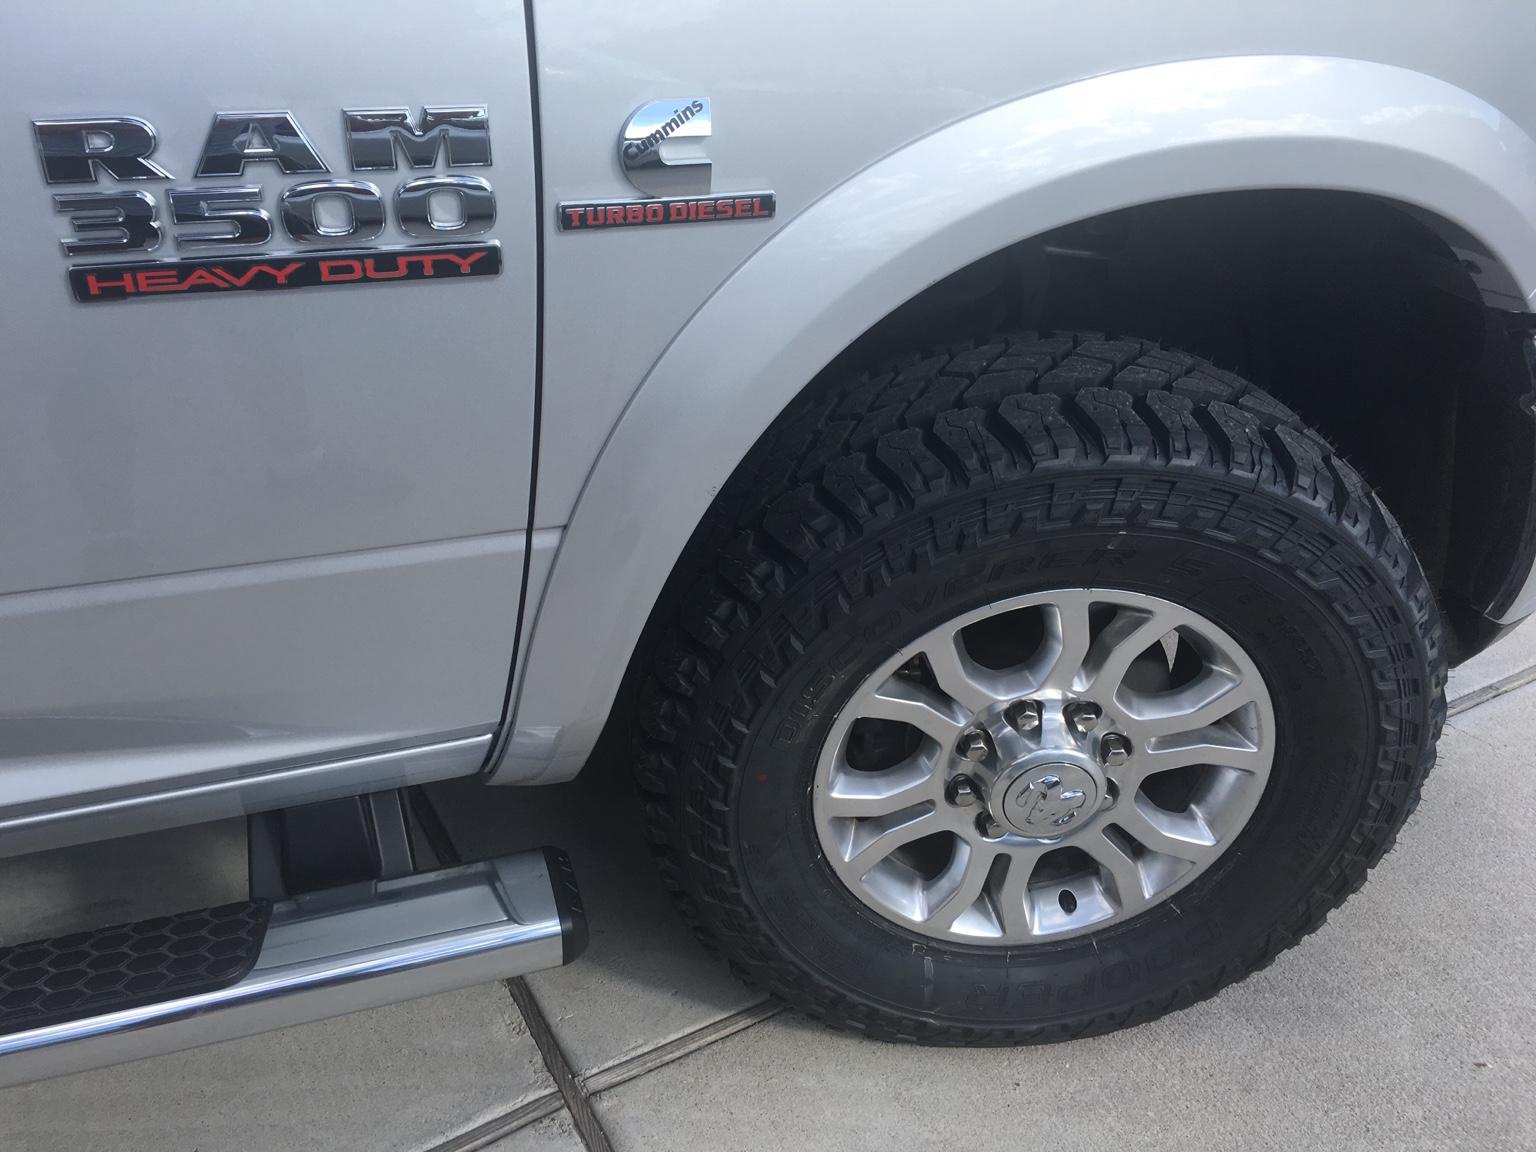 D C B Ece C Fab B on Dodge Ram 3500 Front